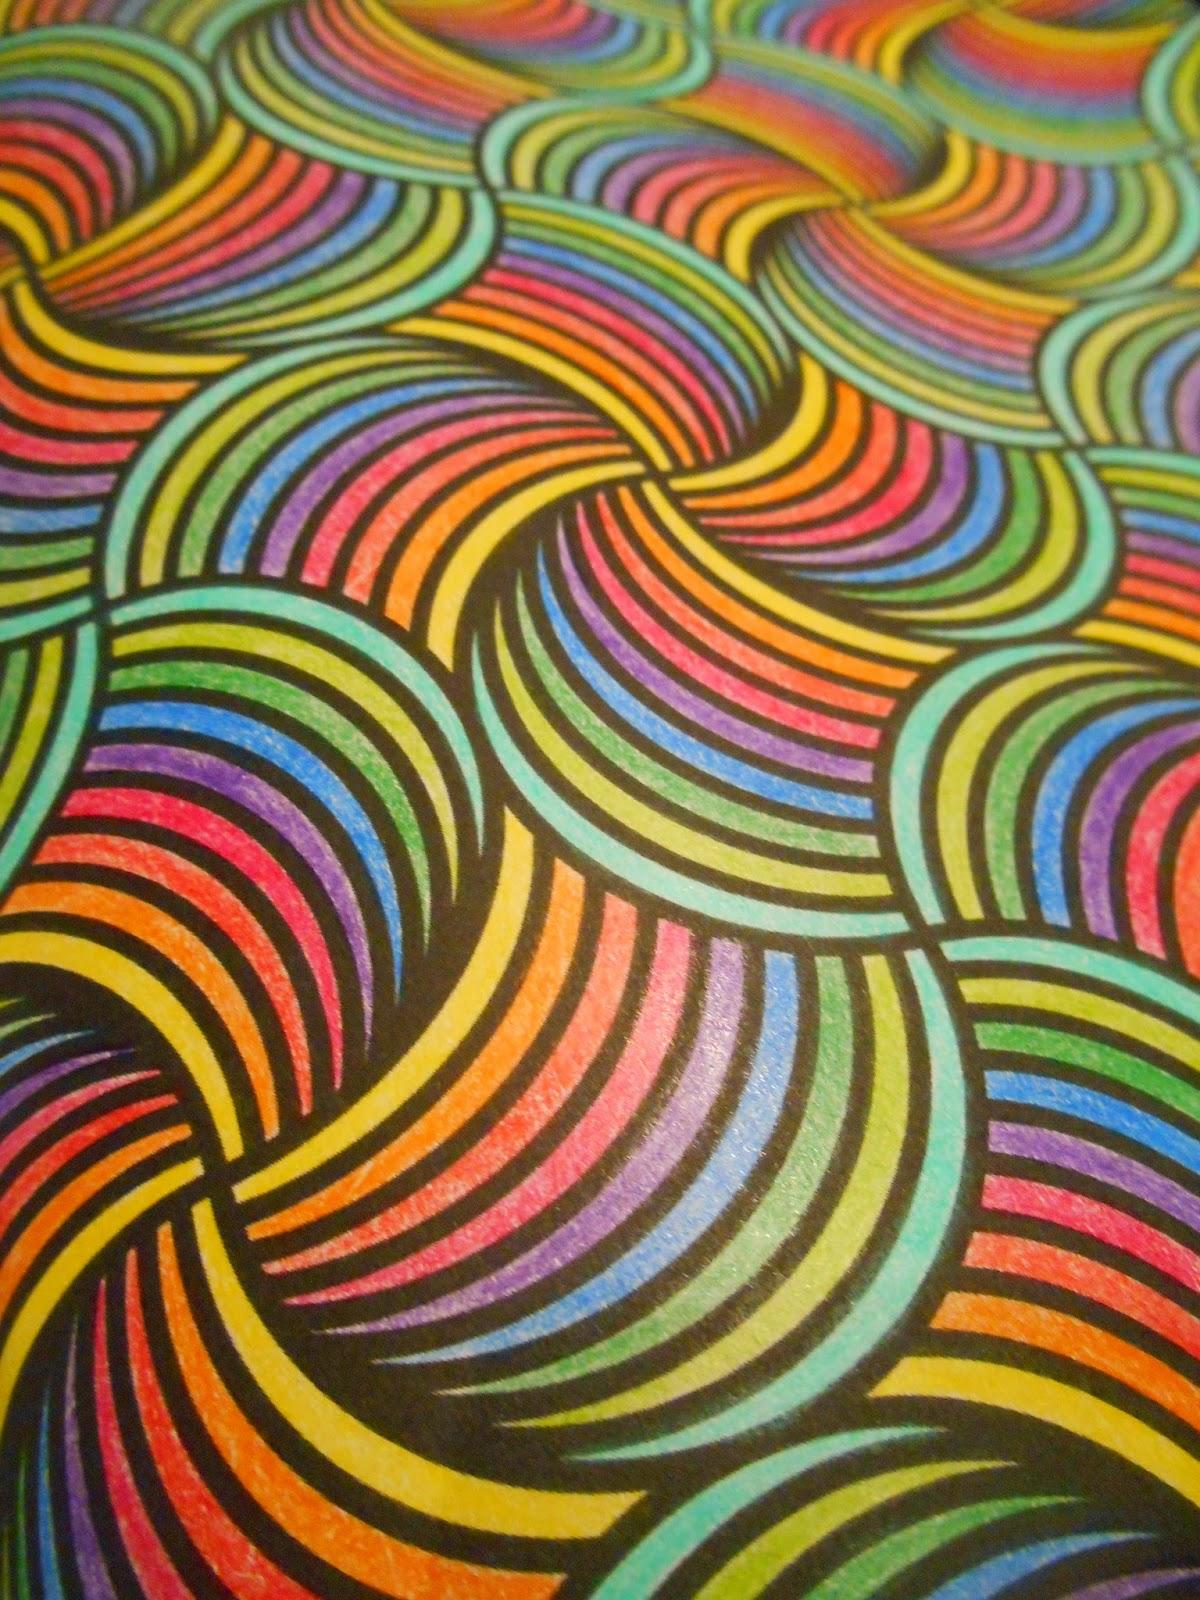 Kleurplaten Volwassenen Ingekleurd.Bovenste Deel Ingekleurde Kleurplaten Voor Volwassenen Krijg